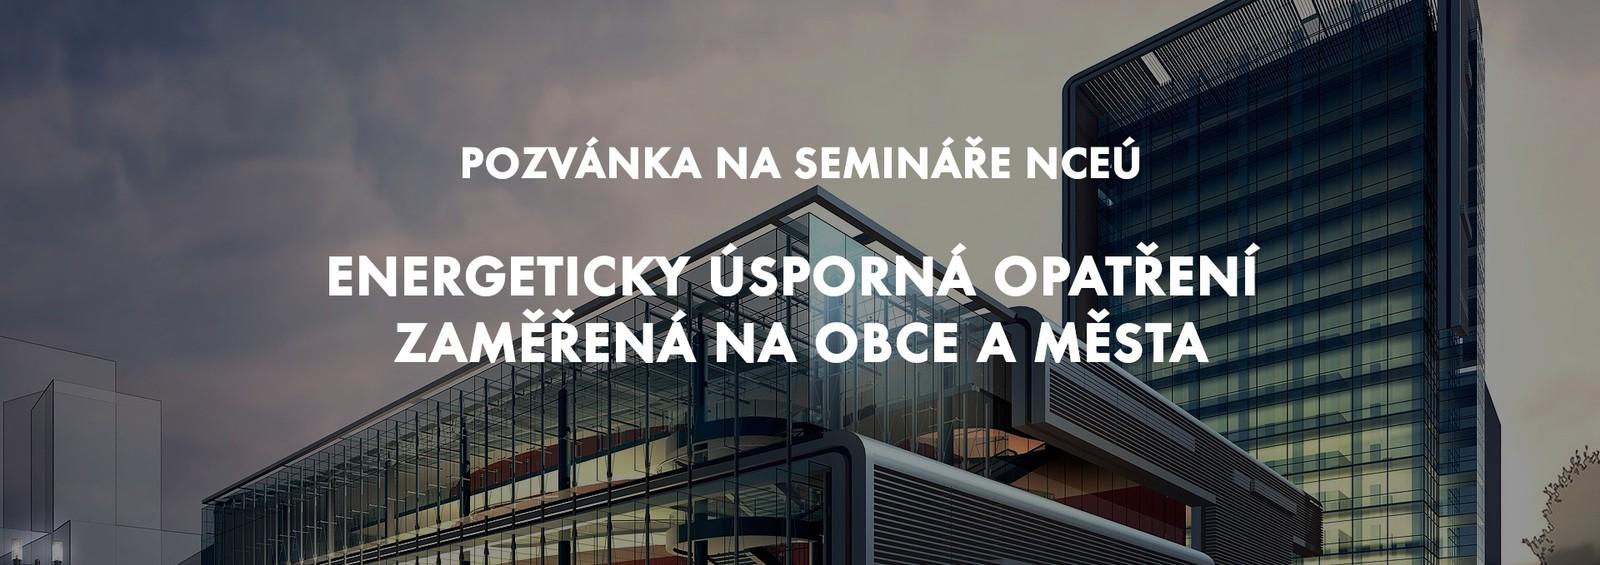 Semináře NCEÚ